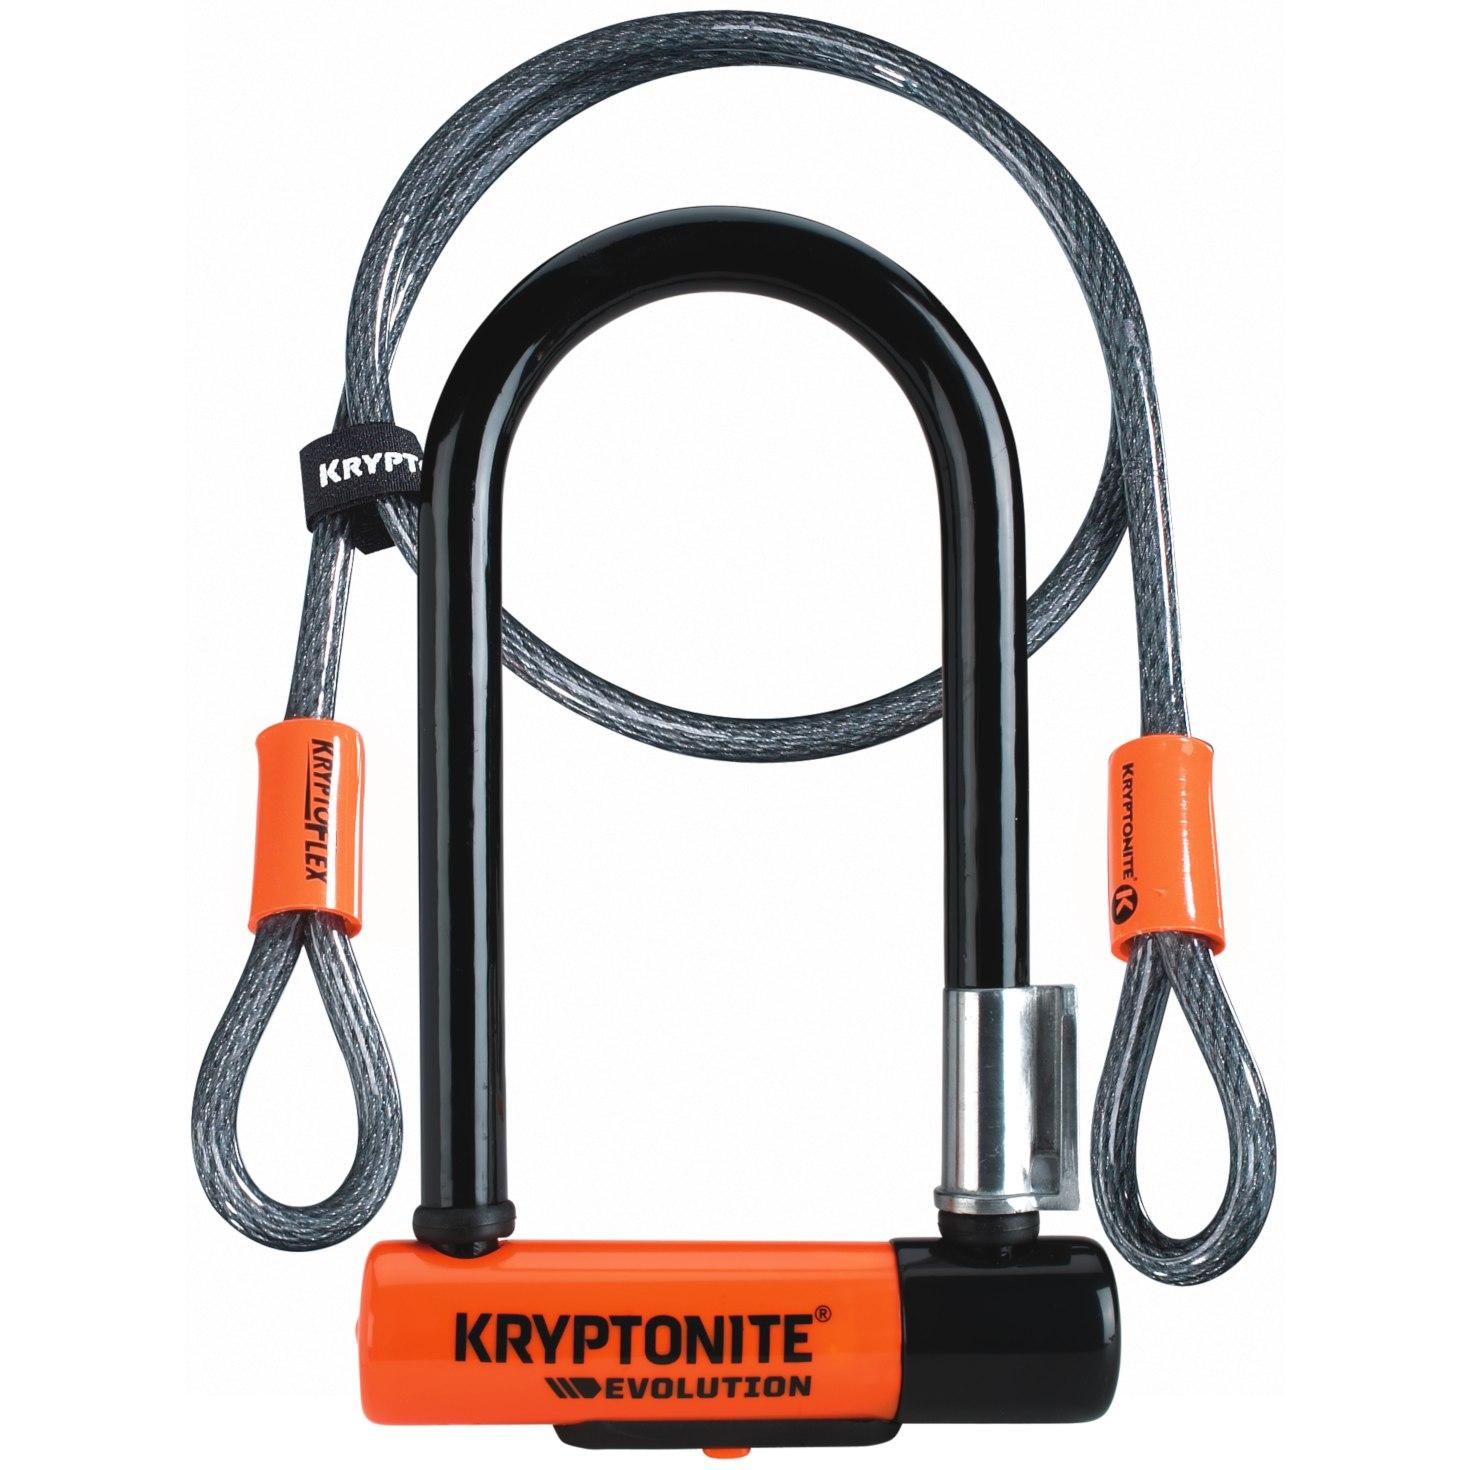 Foto de Kryptonite Evolution Mini-7 U-Lock + 120cm Kryptoflex Cable